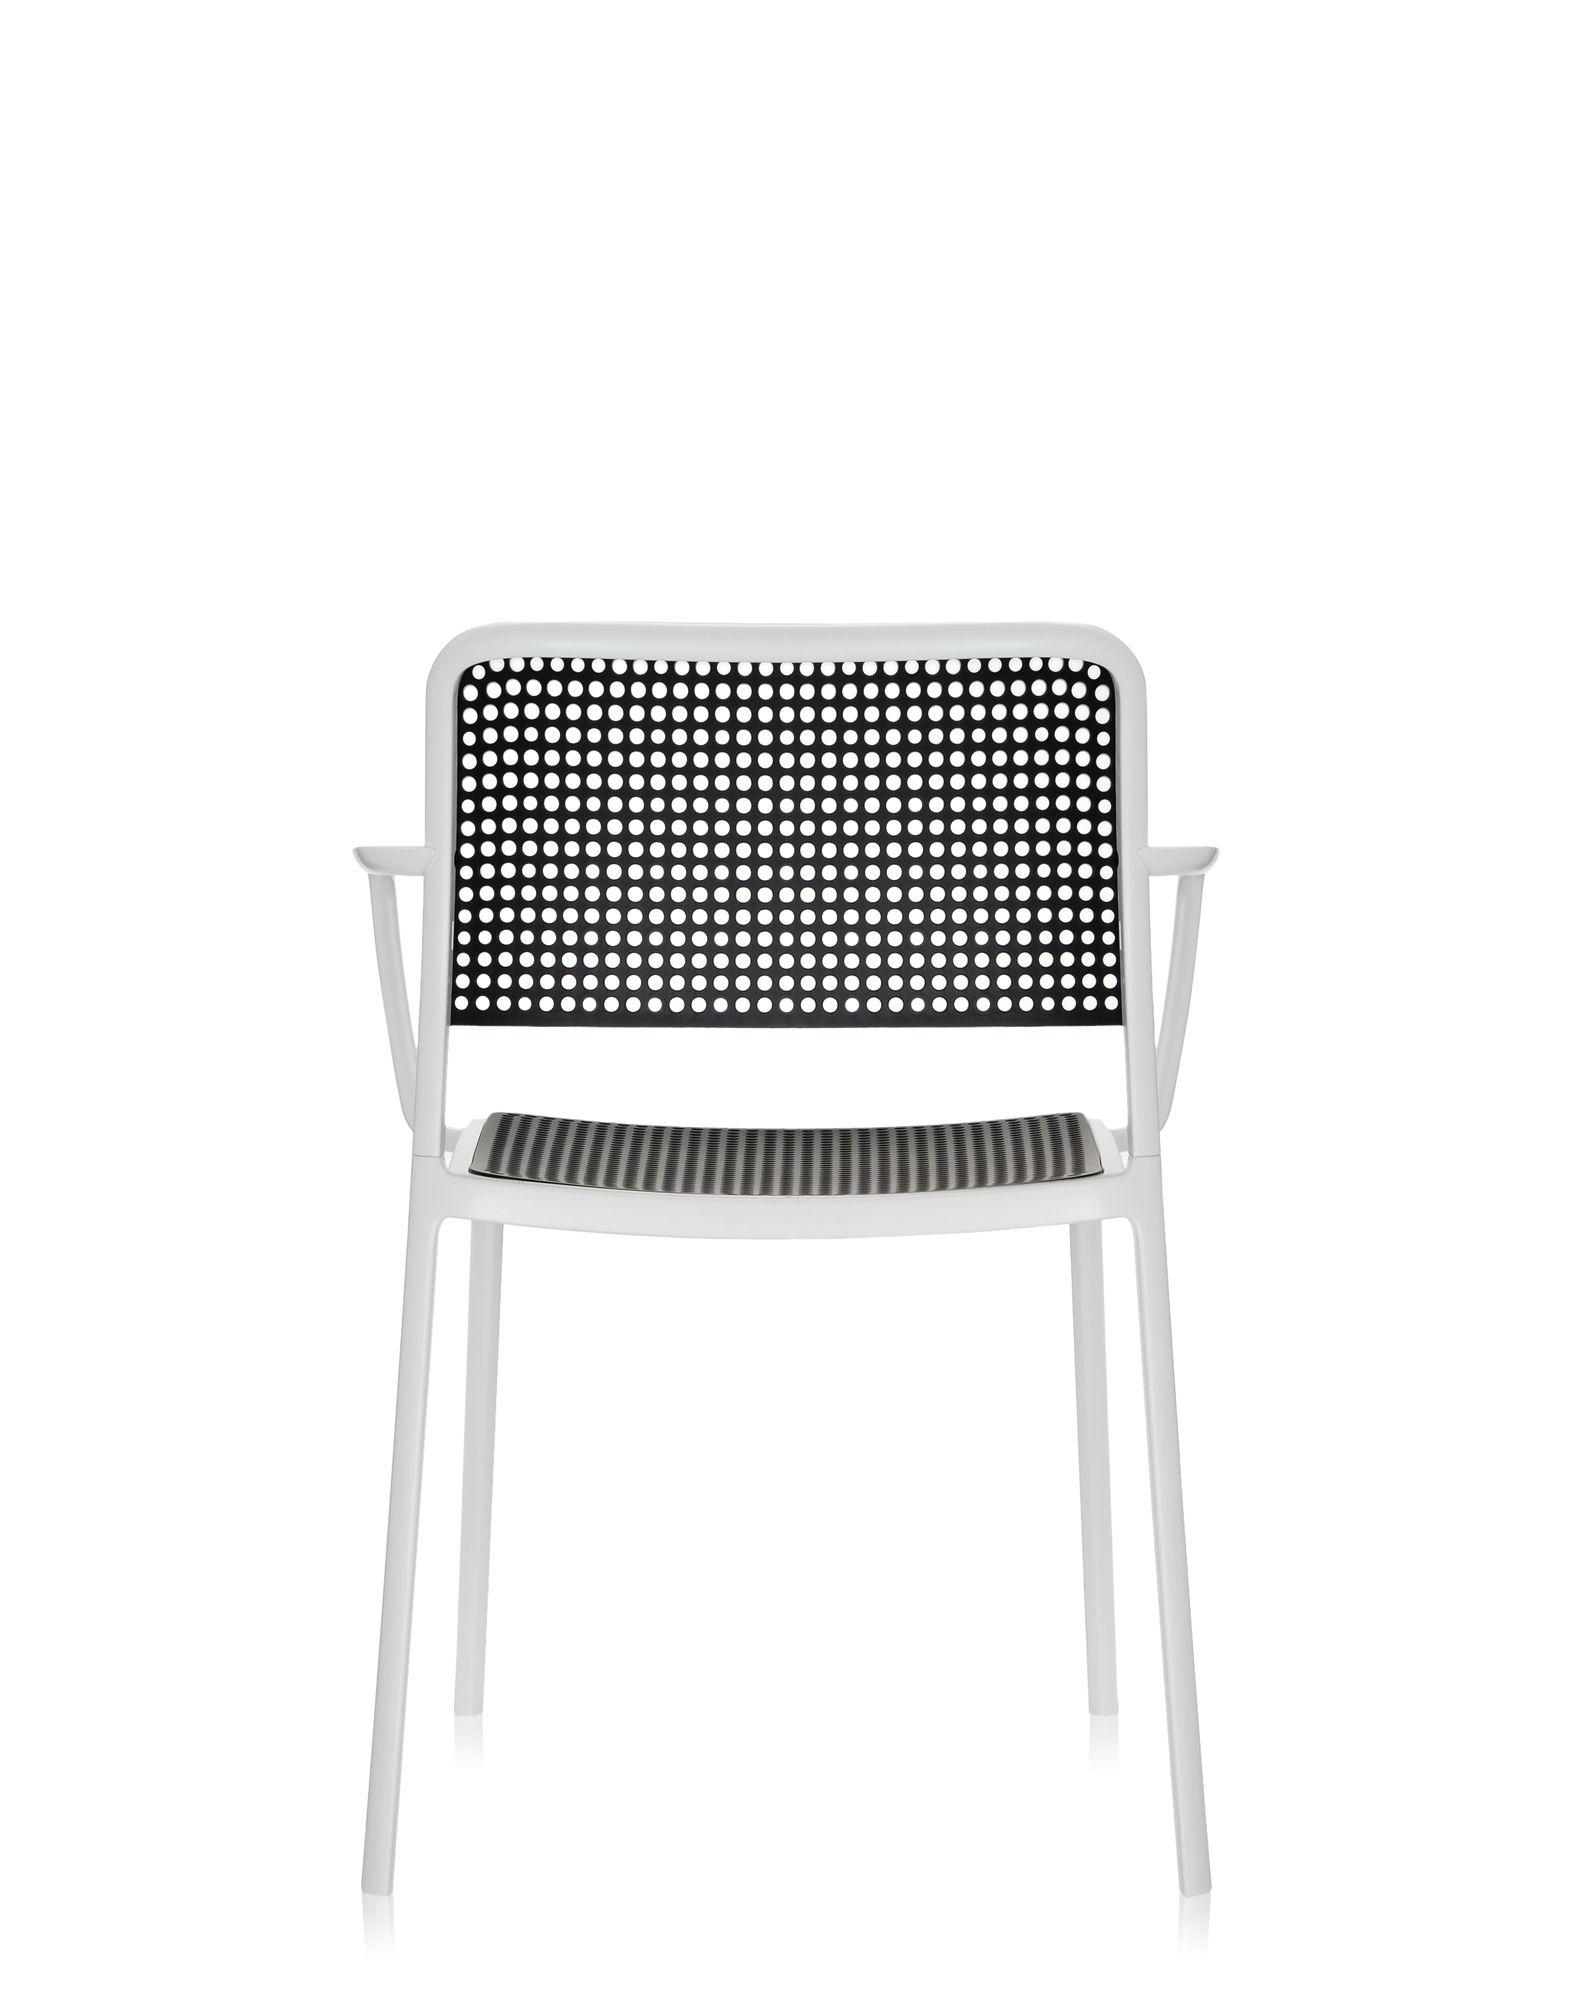 Kartell audrey nero alluminio verniciato bianco sedie for Sedie alluminio design